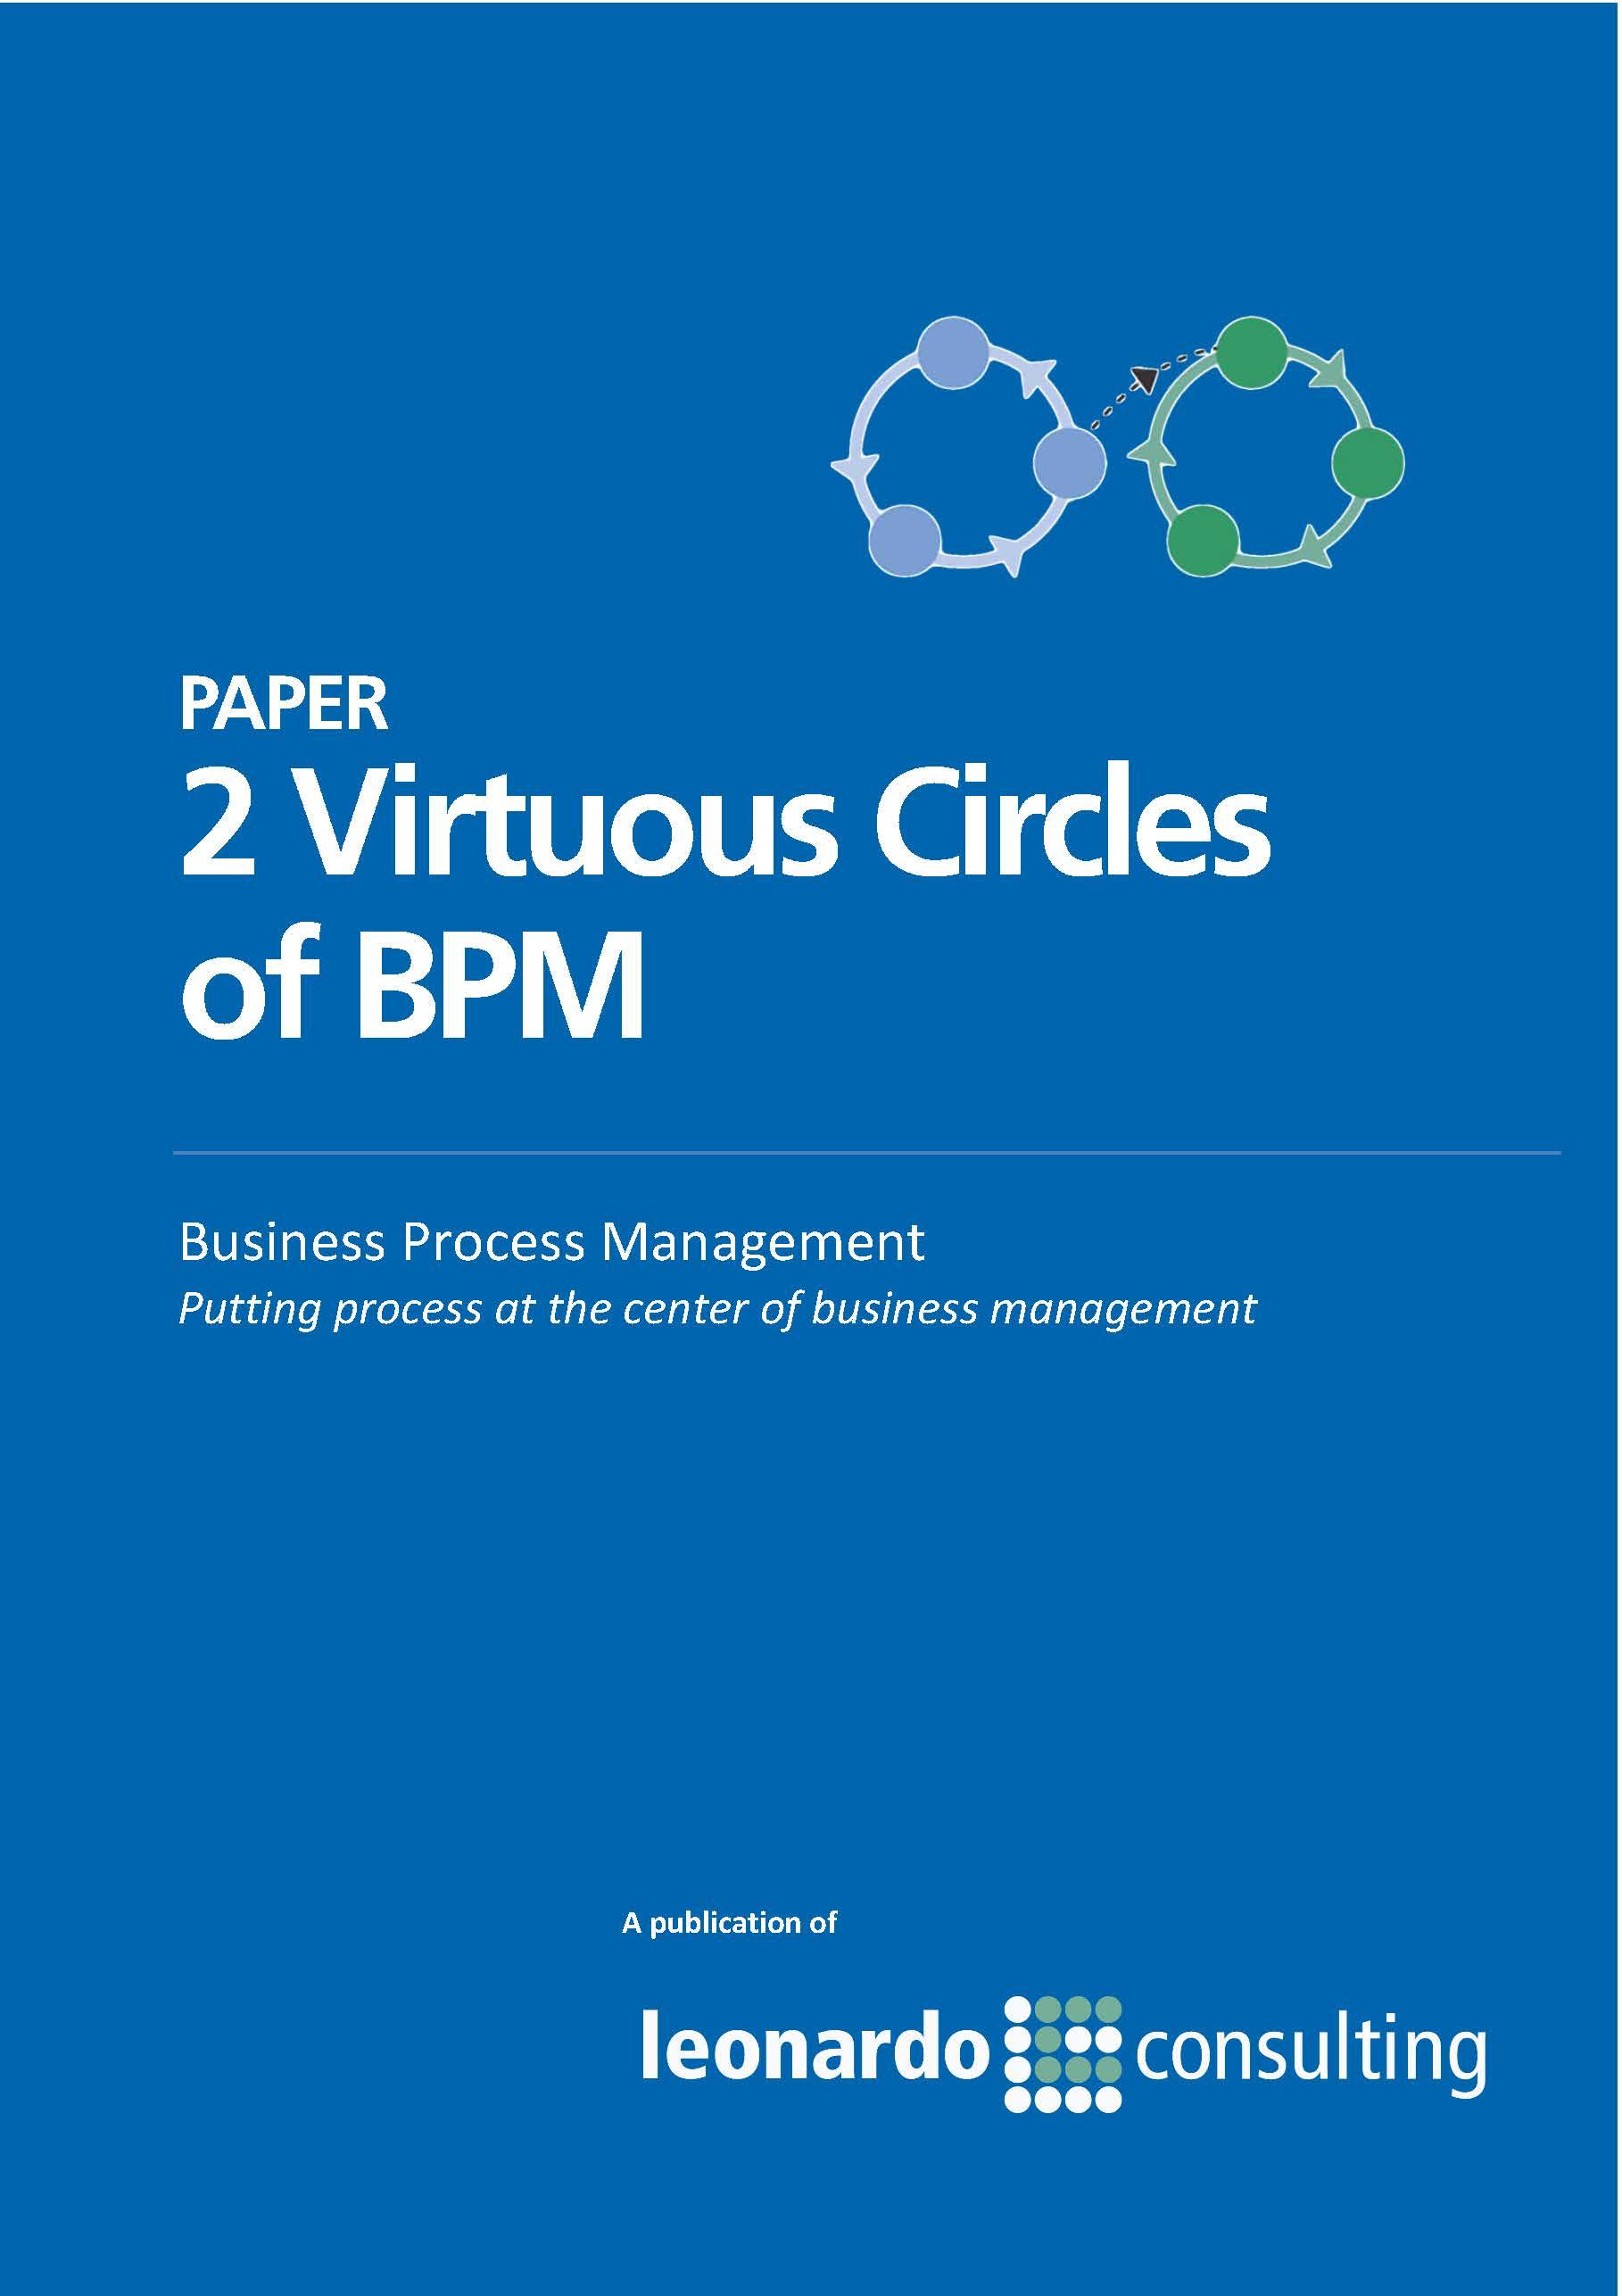 2 Virtuous Circles of BPM